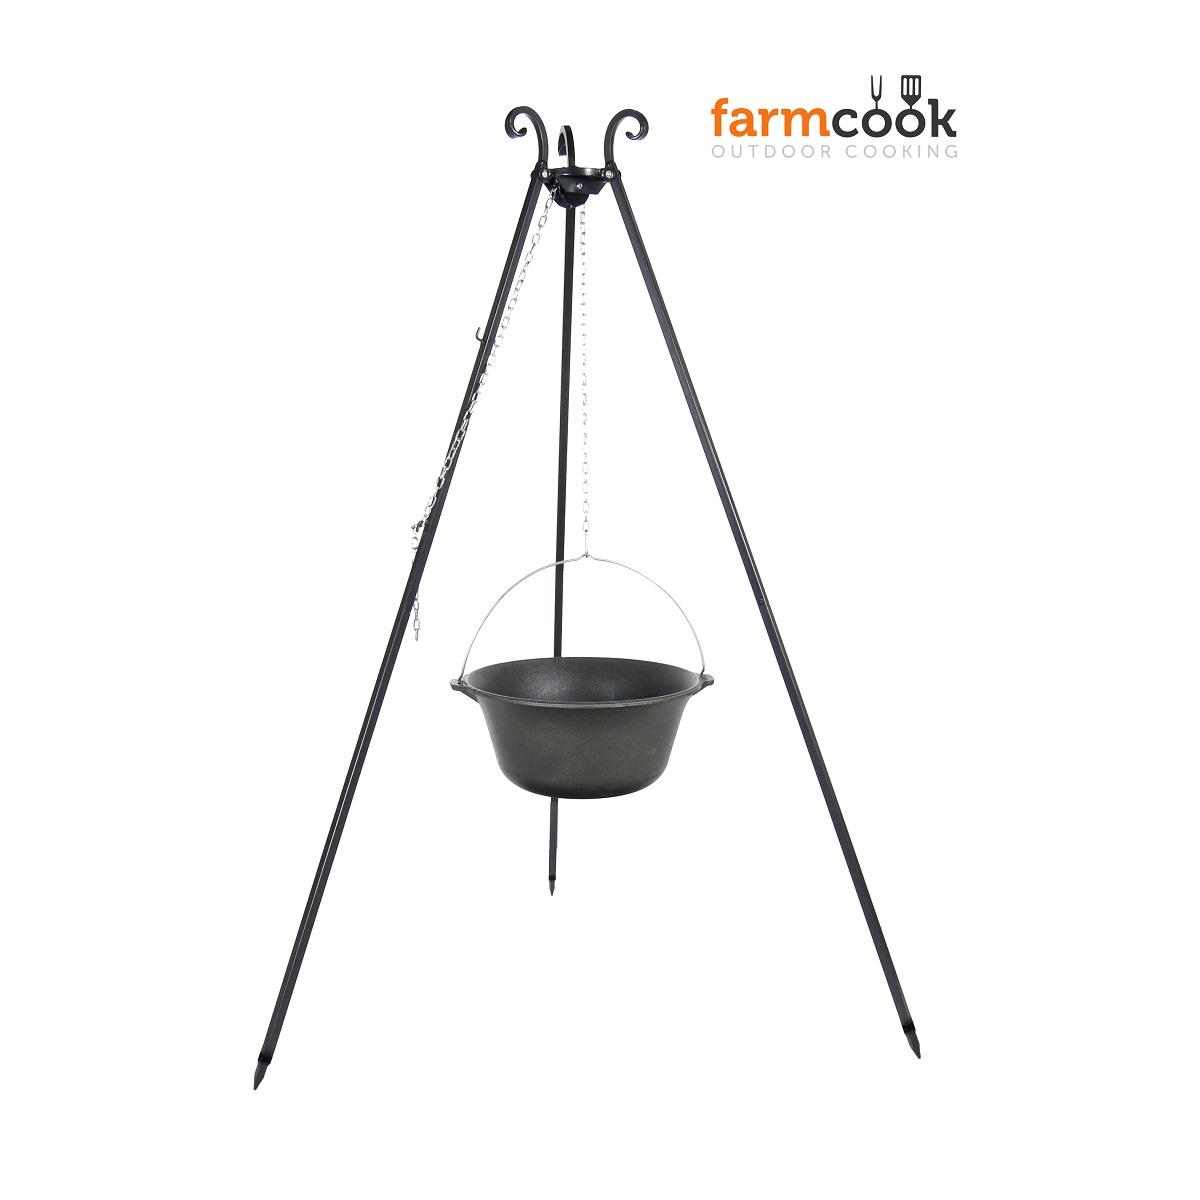 Trojnožka FARMCOOK Viking s kotlíkem 11 litrů